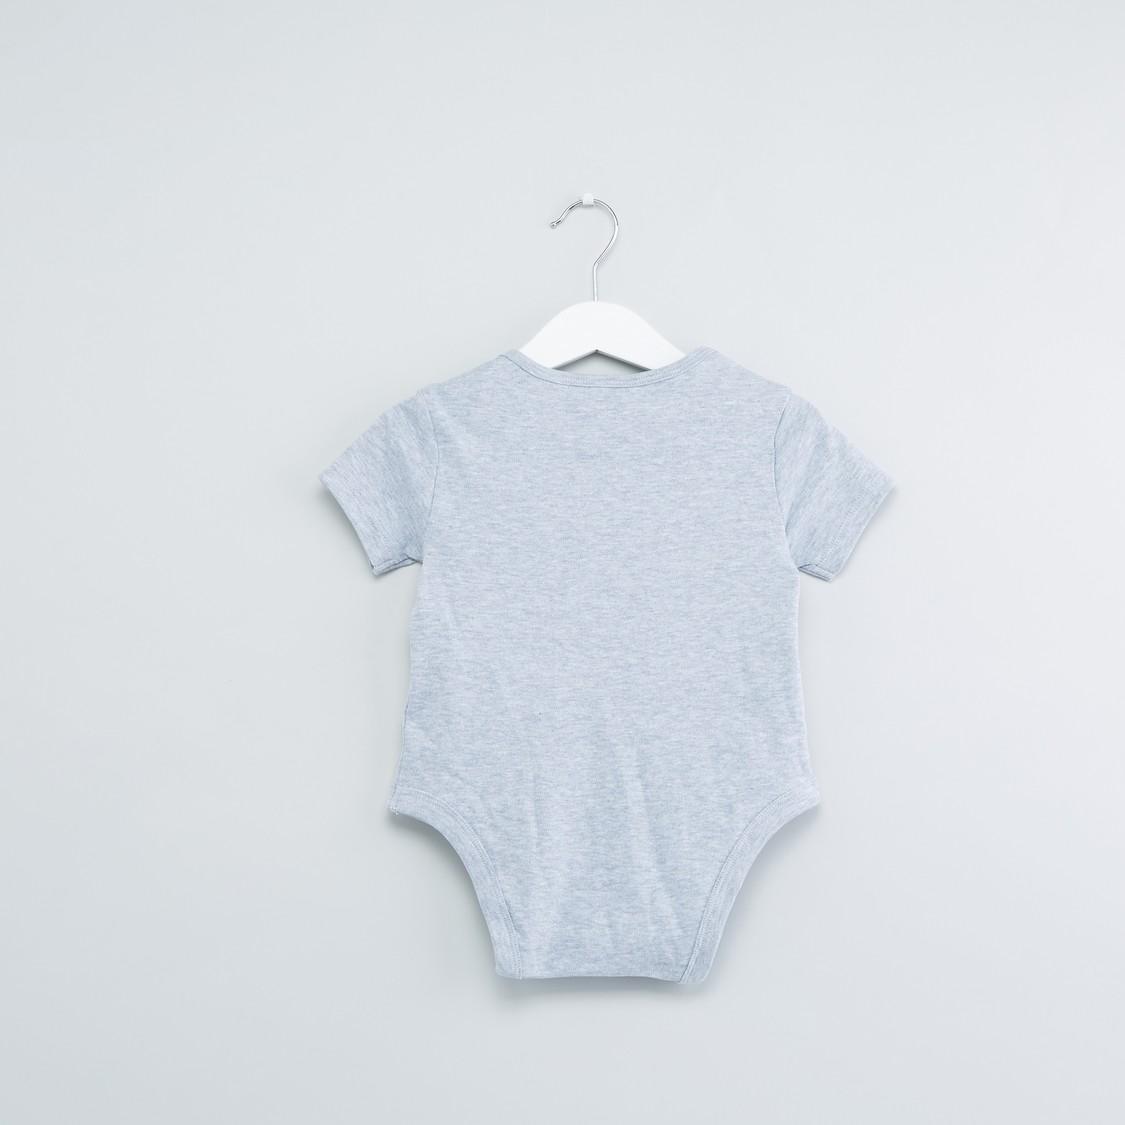 Dumbo Printed Bodysuit - Set of 2